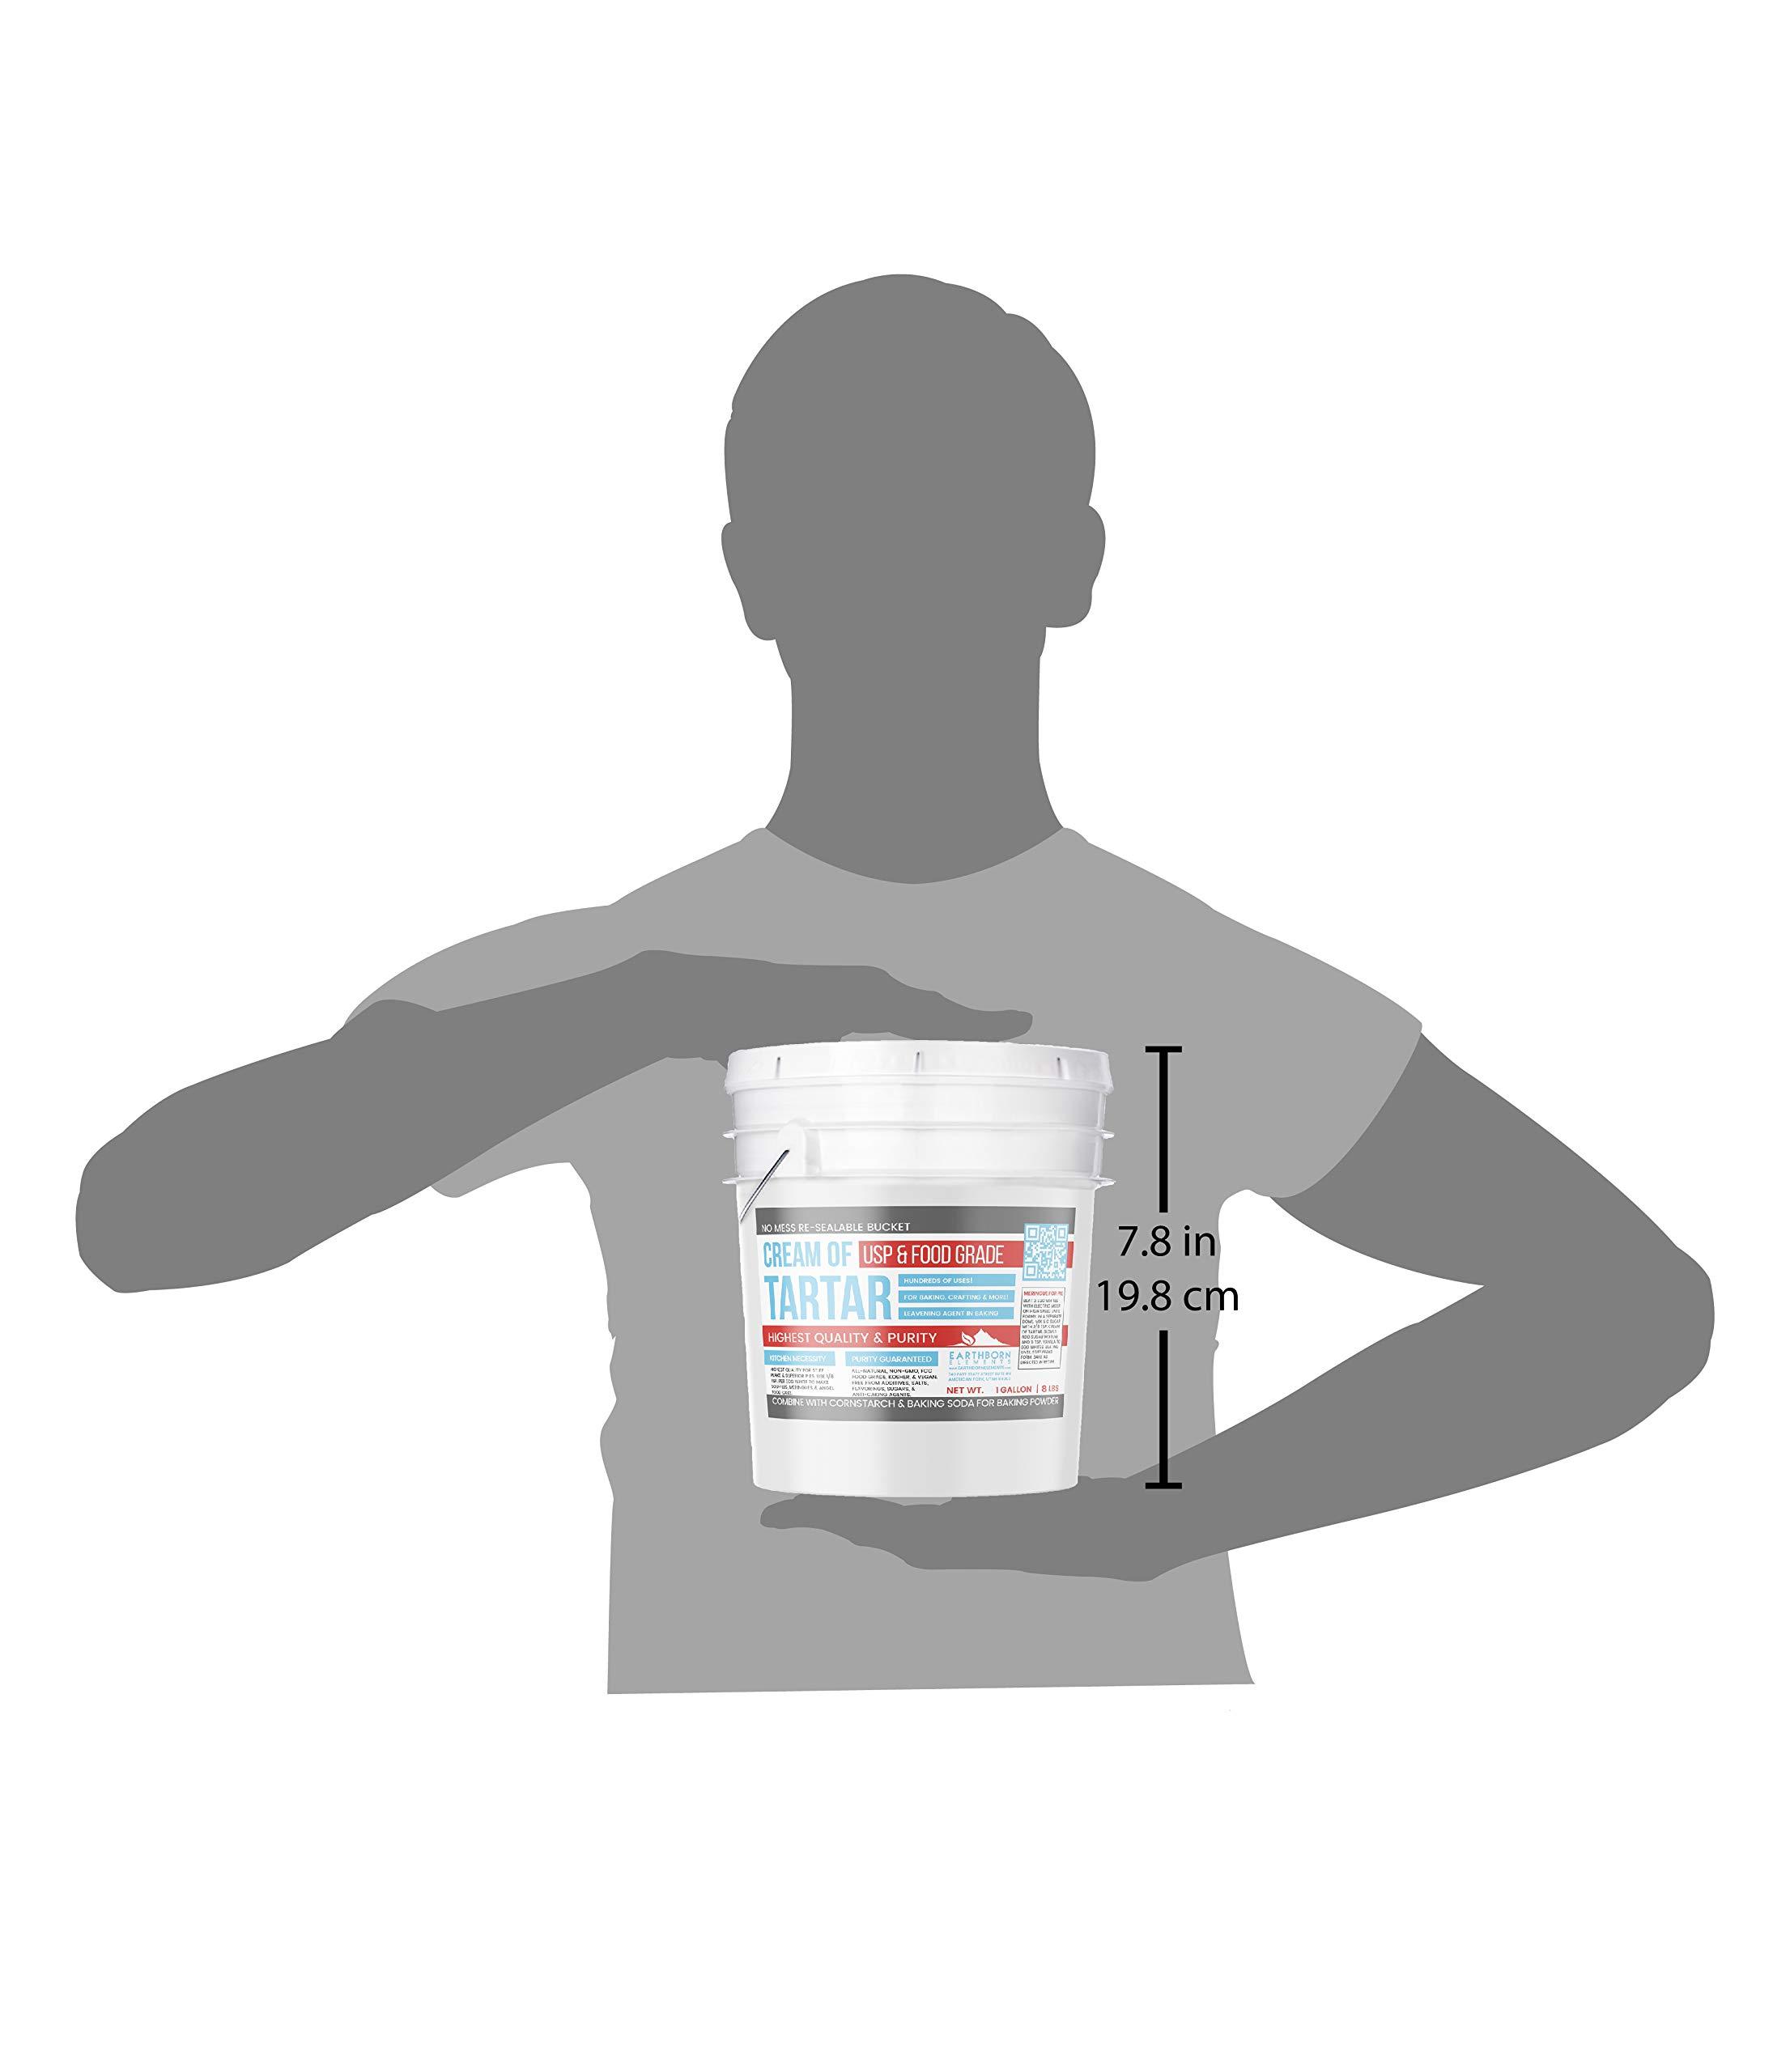 Cream of Tartar (1 Gallon) by Earthborn Elements, Resealable Bucket, Highest Purity, Baking Additive, Non-GMO, Kosher, Gluten-Free, All-Natural, DIY Bath Bombs by Earthborn Elements (Image #4)